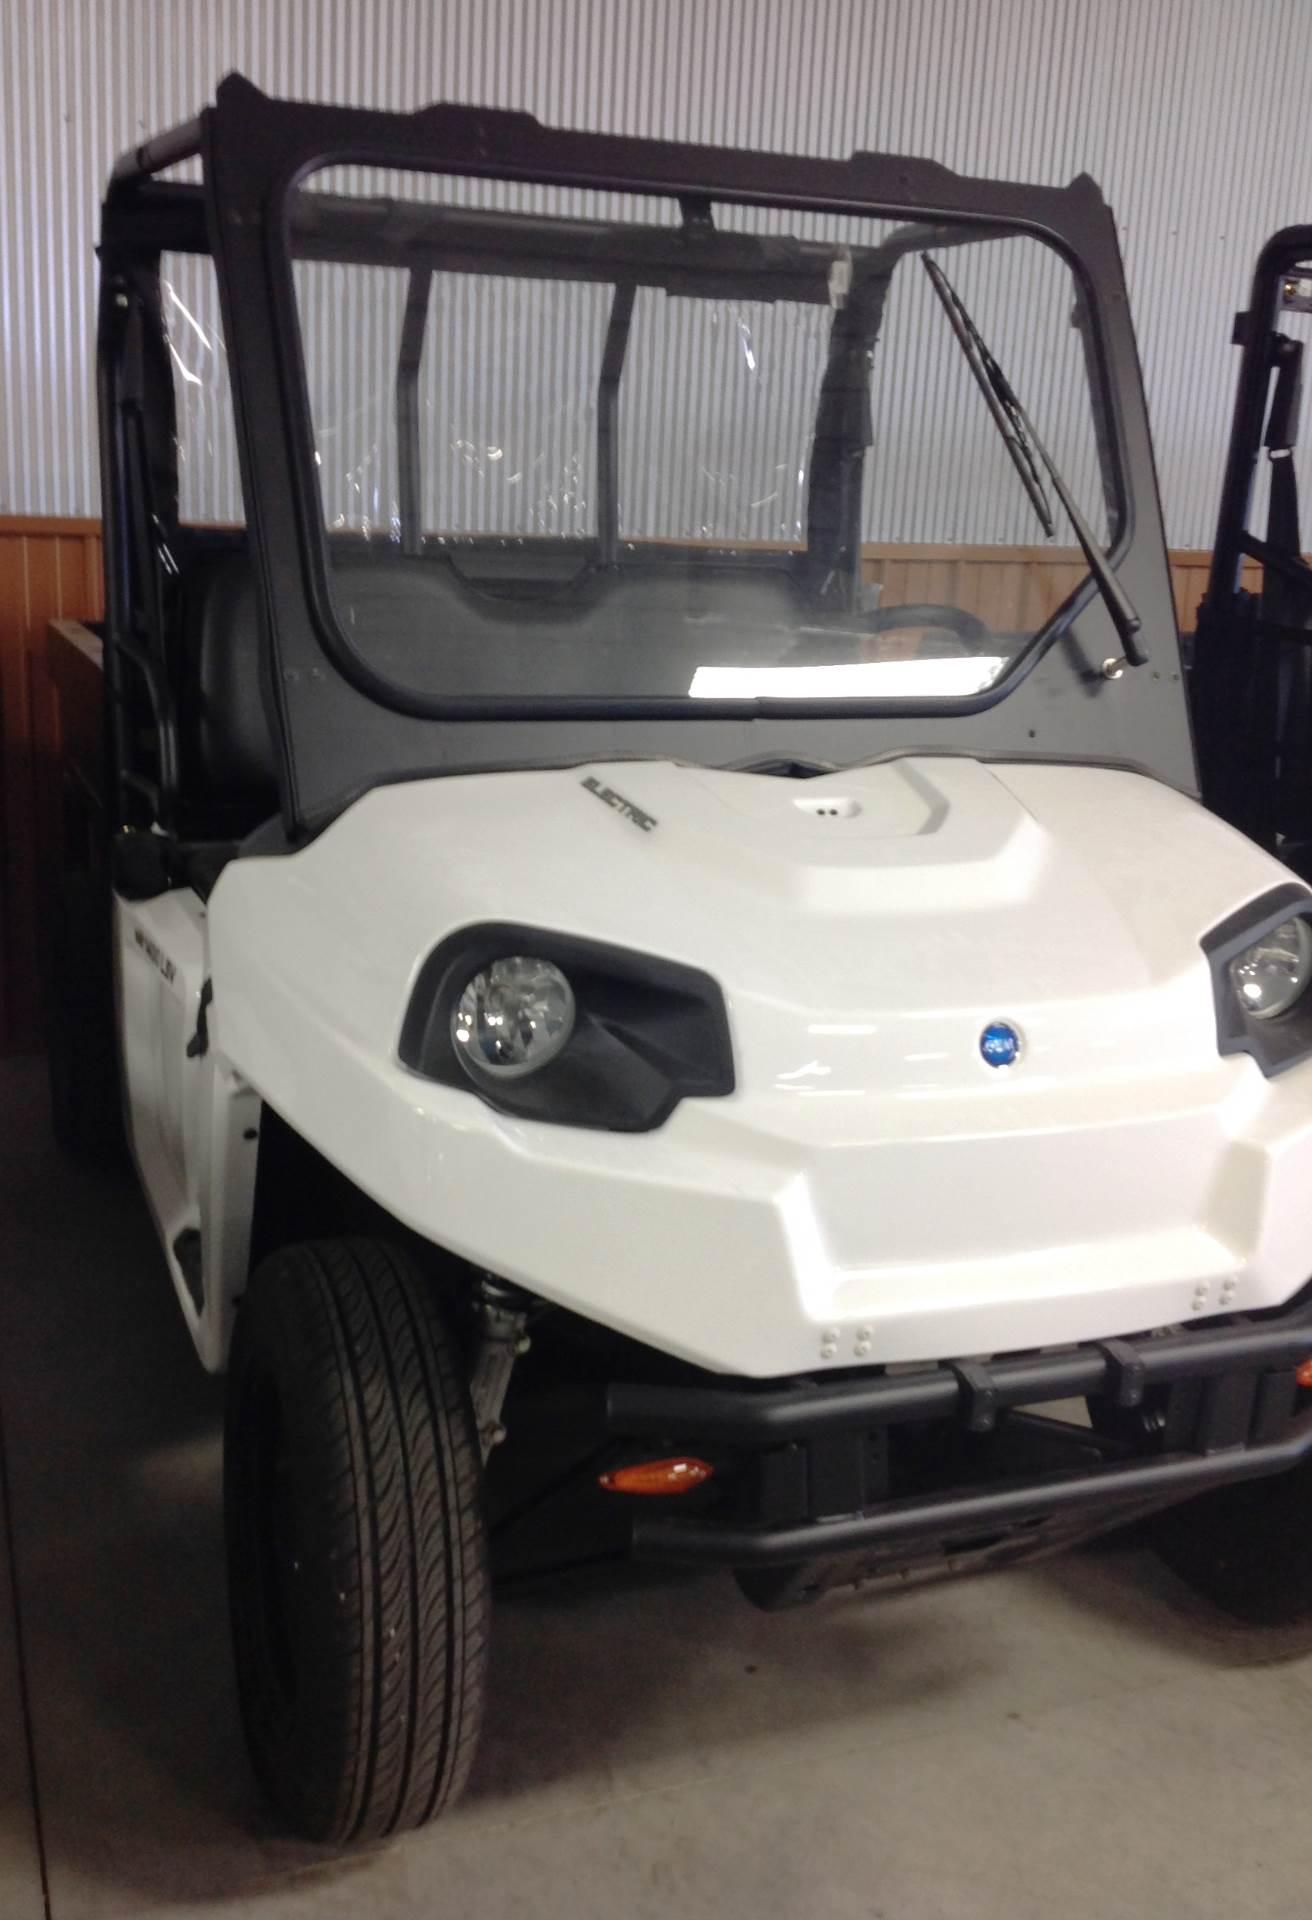 New 2015 GEM eM™1400 LSV Utility Vehicles in Ottumwa, IA   Stock ...